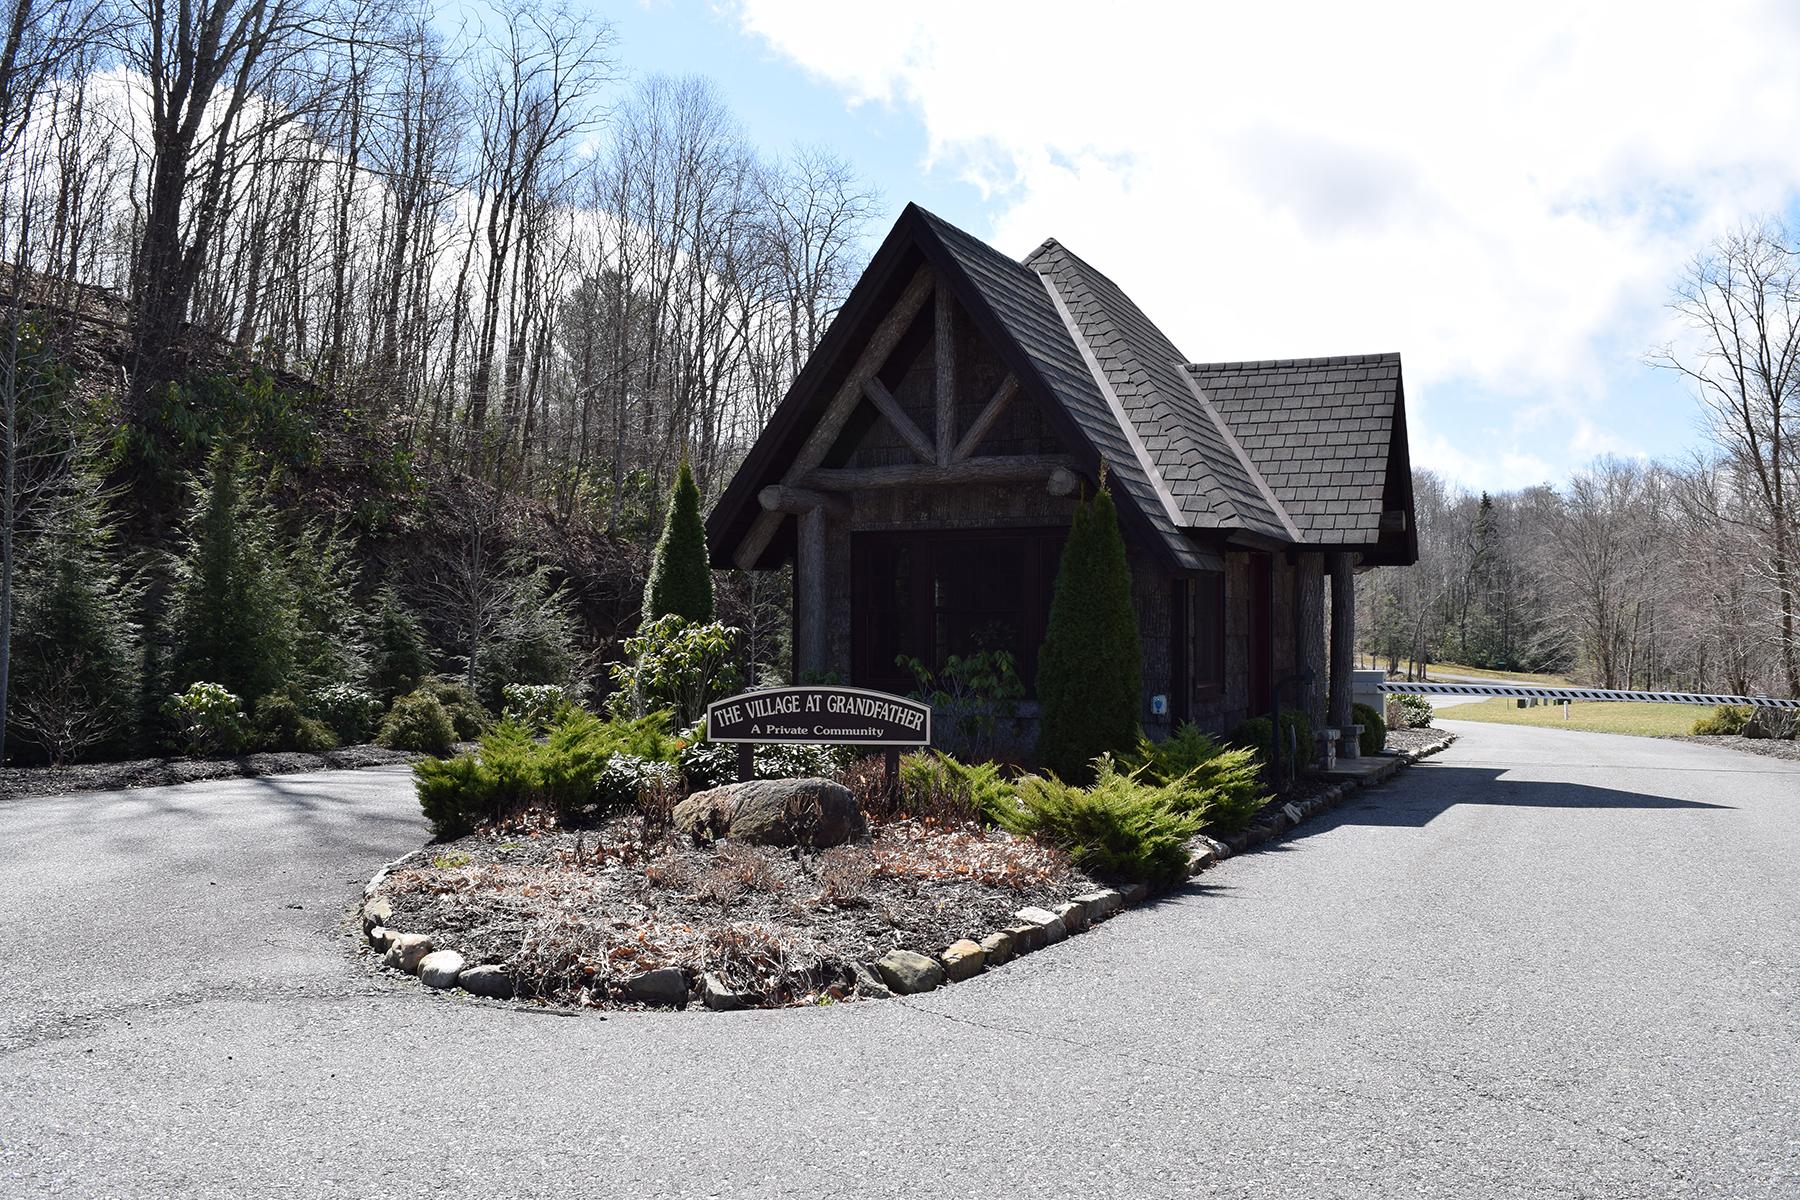 Land for Sale at LINVILLE - THE VILLAGE AT GRANDFATHER Tbd Trillium Rd, Linville, North Carolina 28646 United States